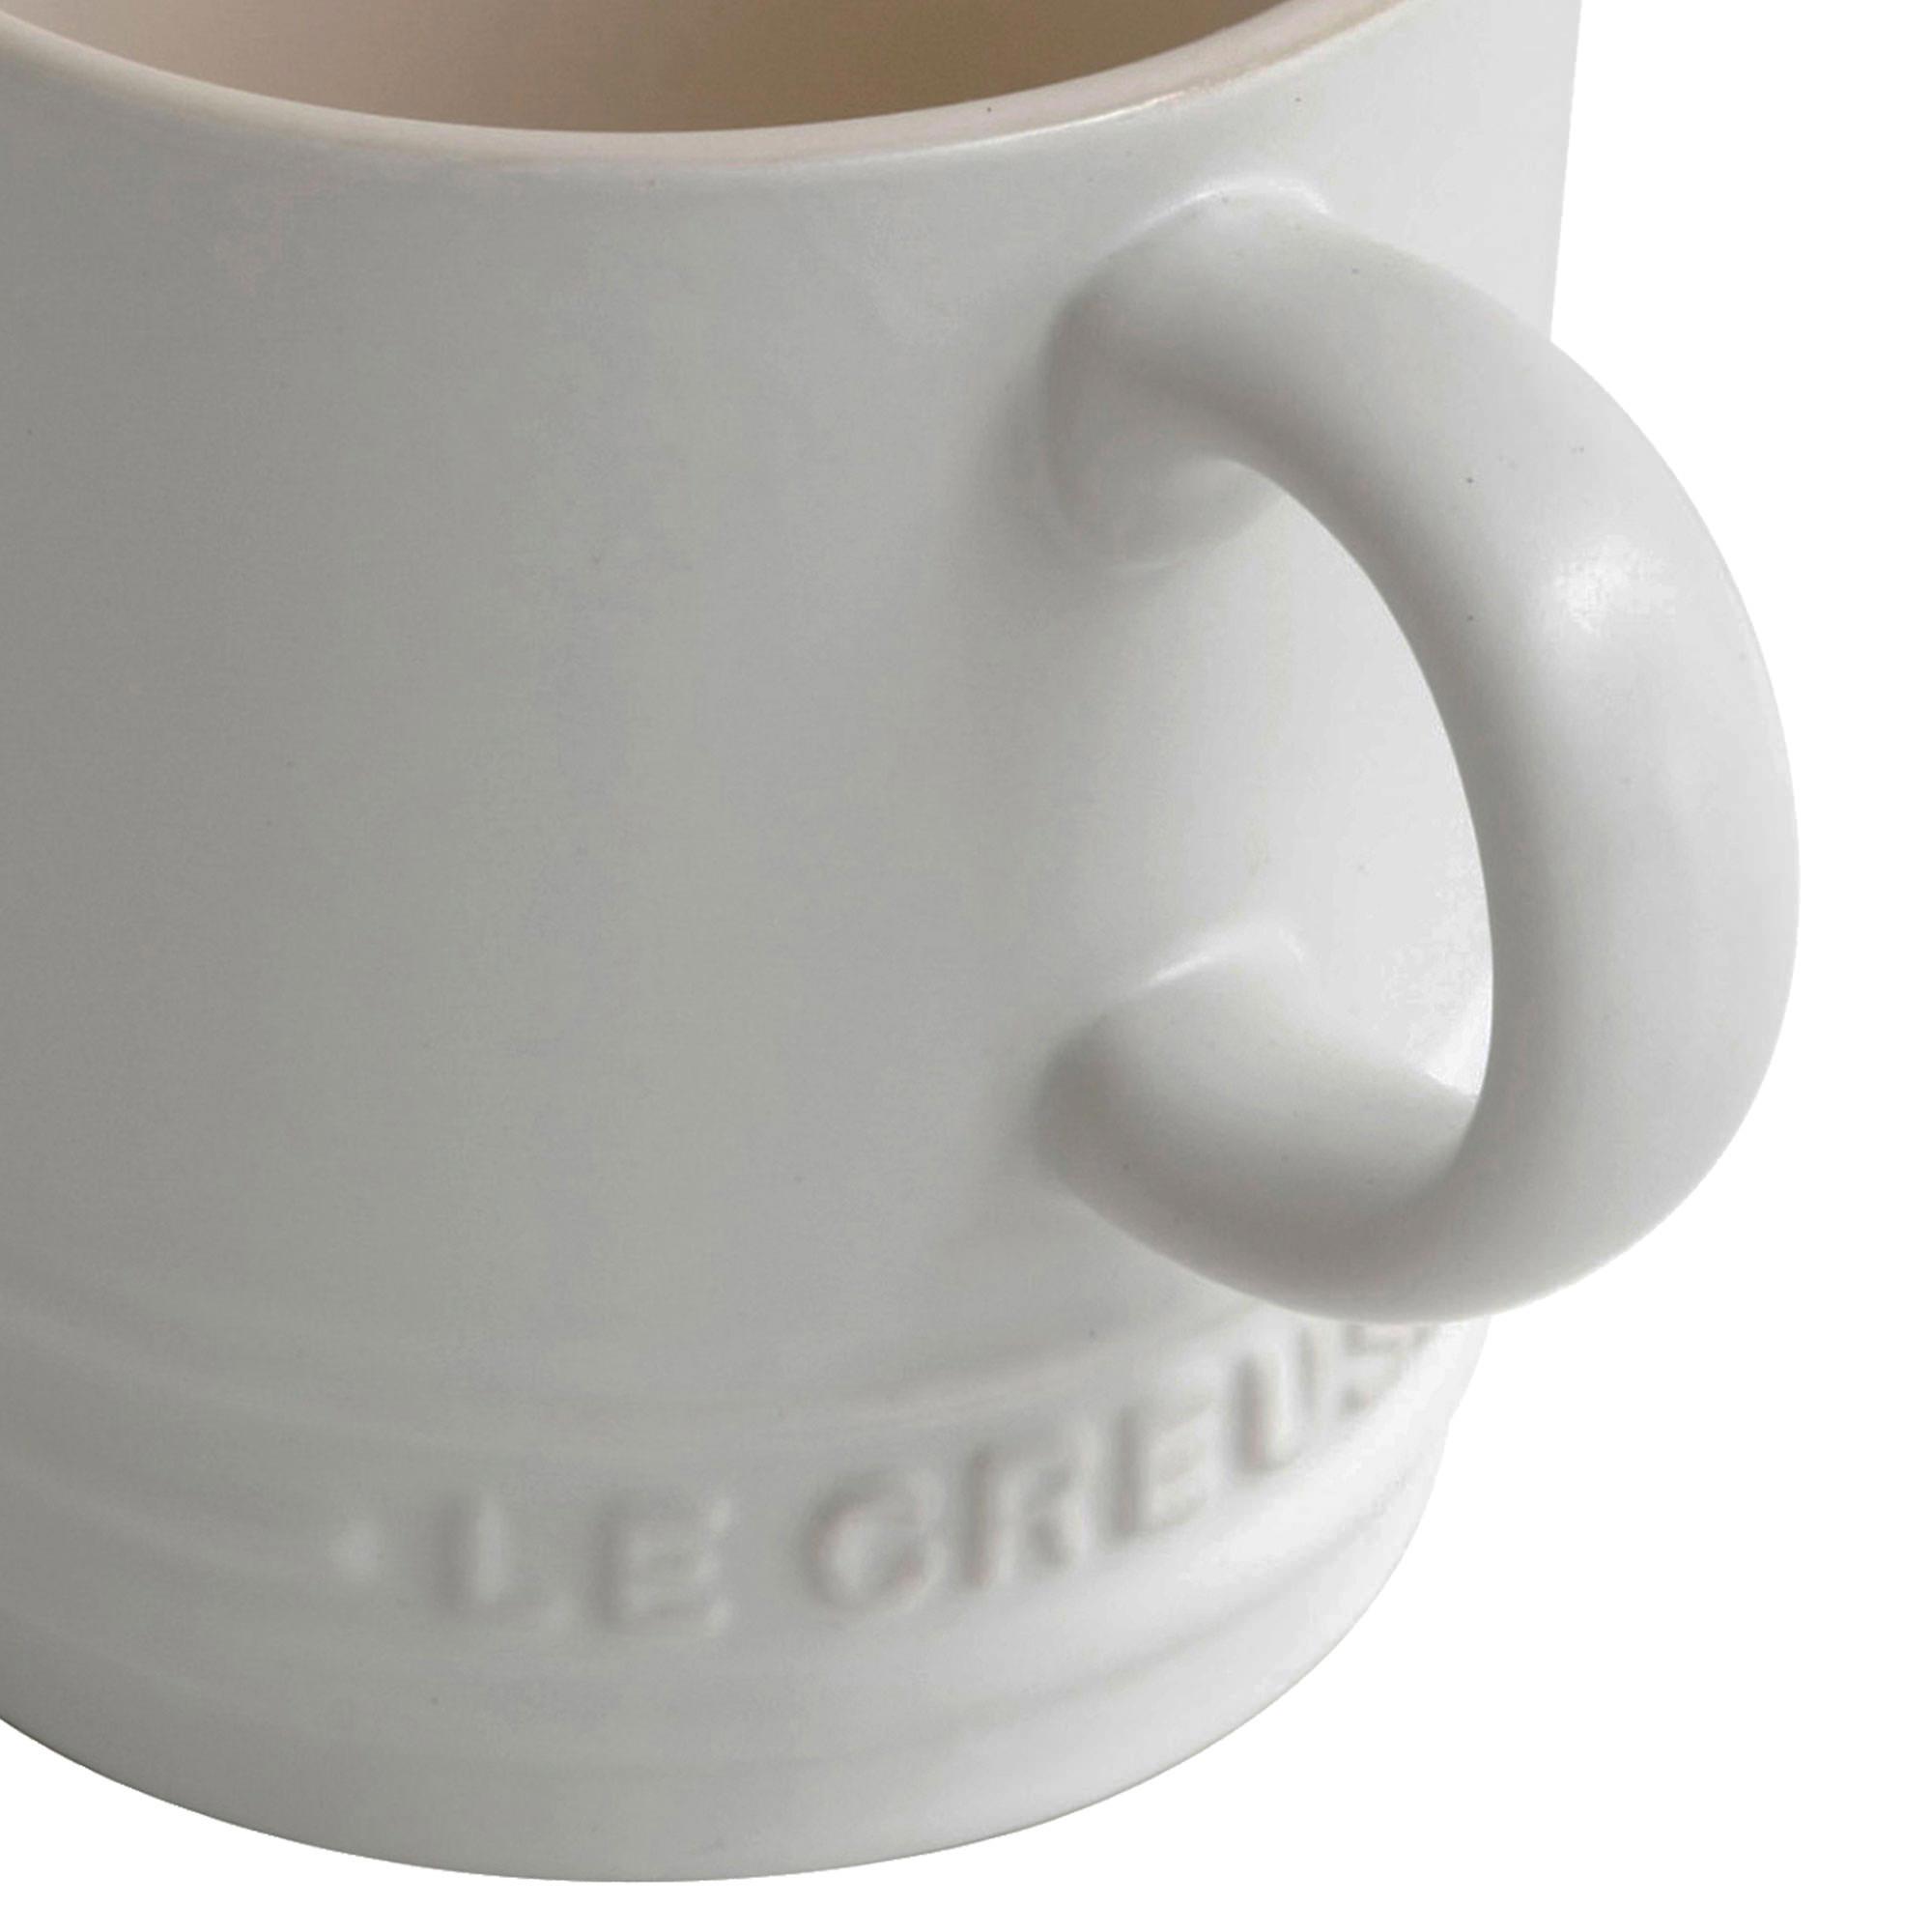 Le Creuset Stoneware Mug 350ml Cotton